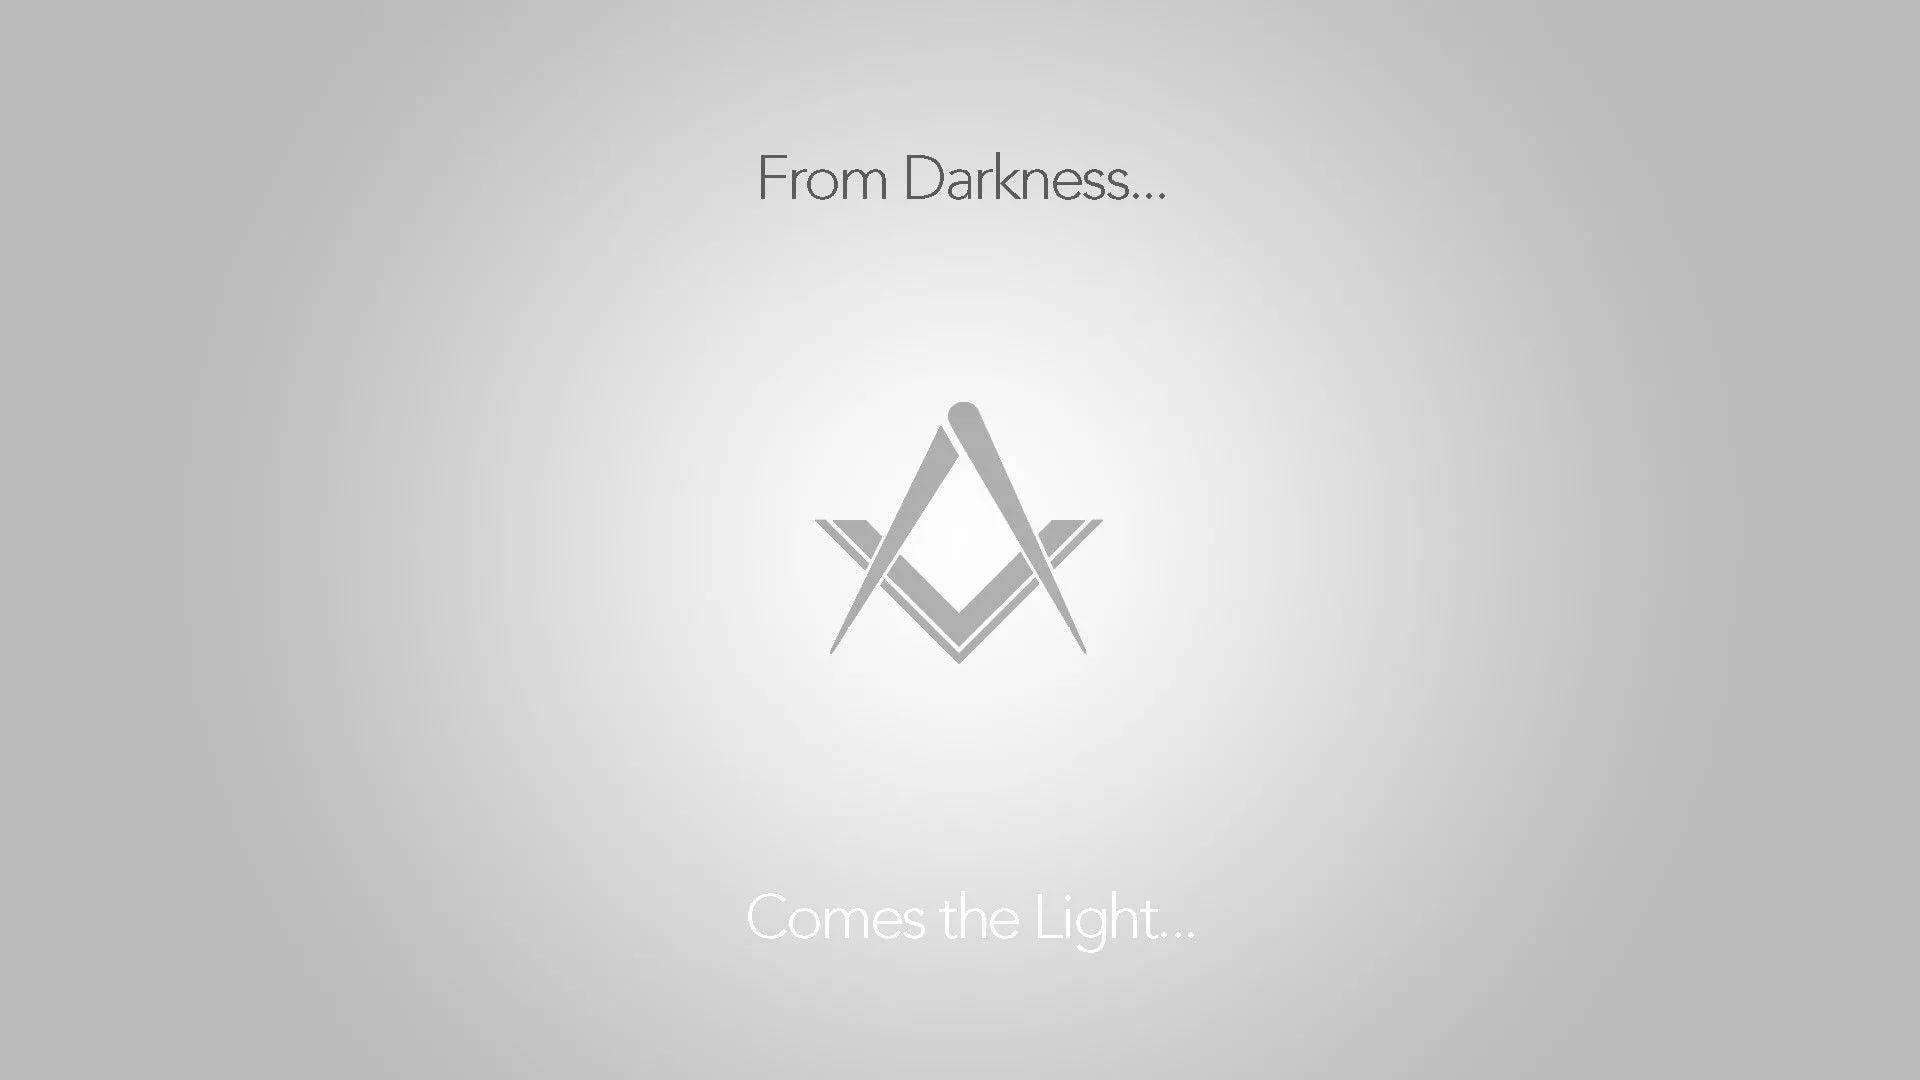 Freemason wallpaper image